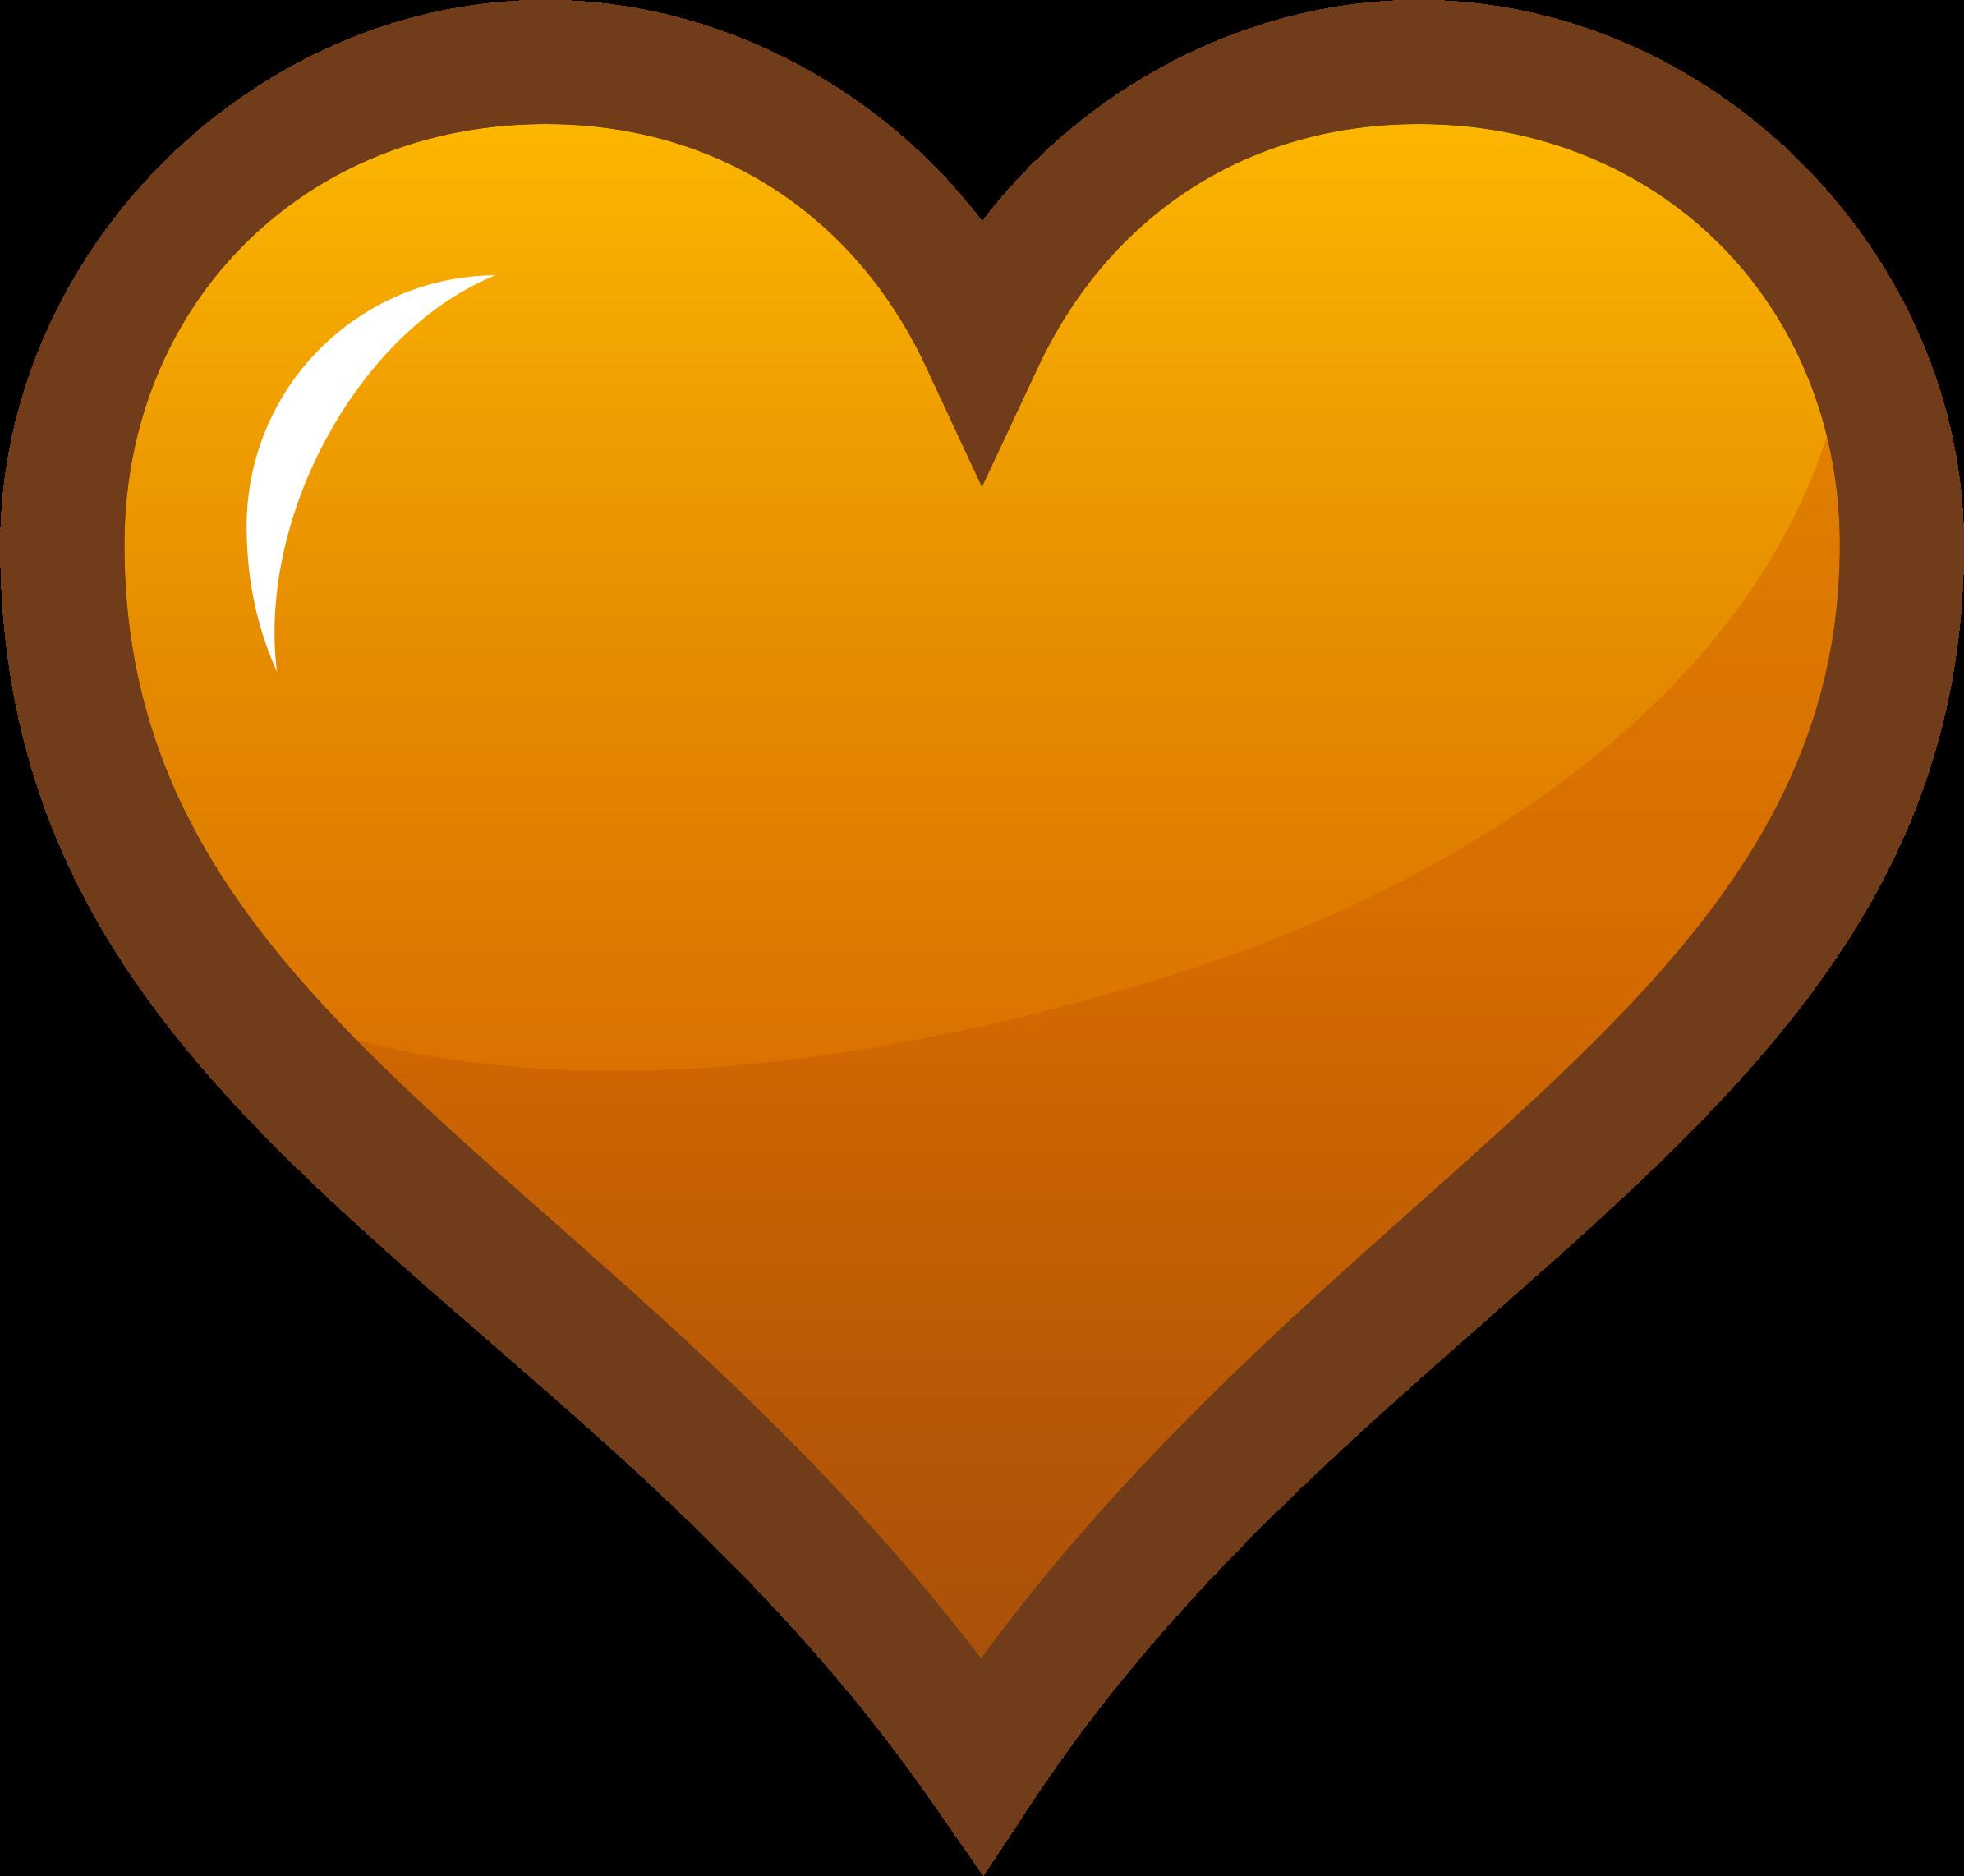 Orange Heart Clipart